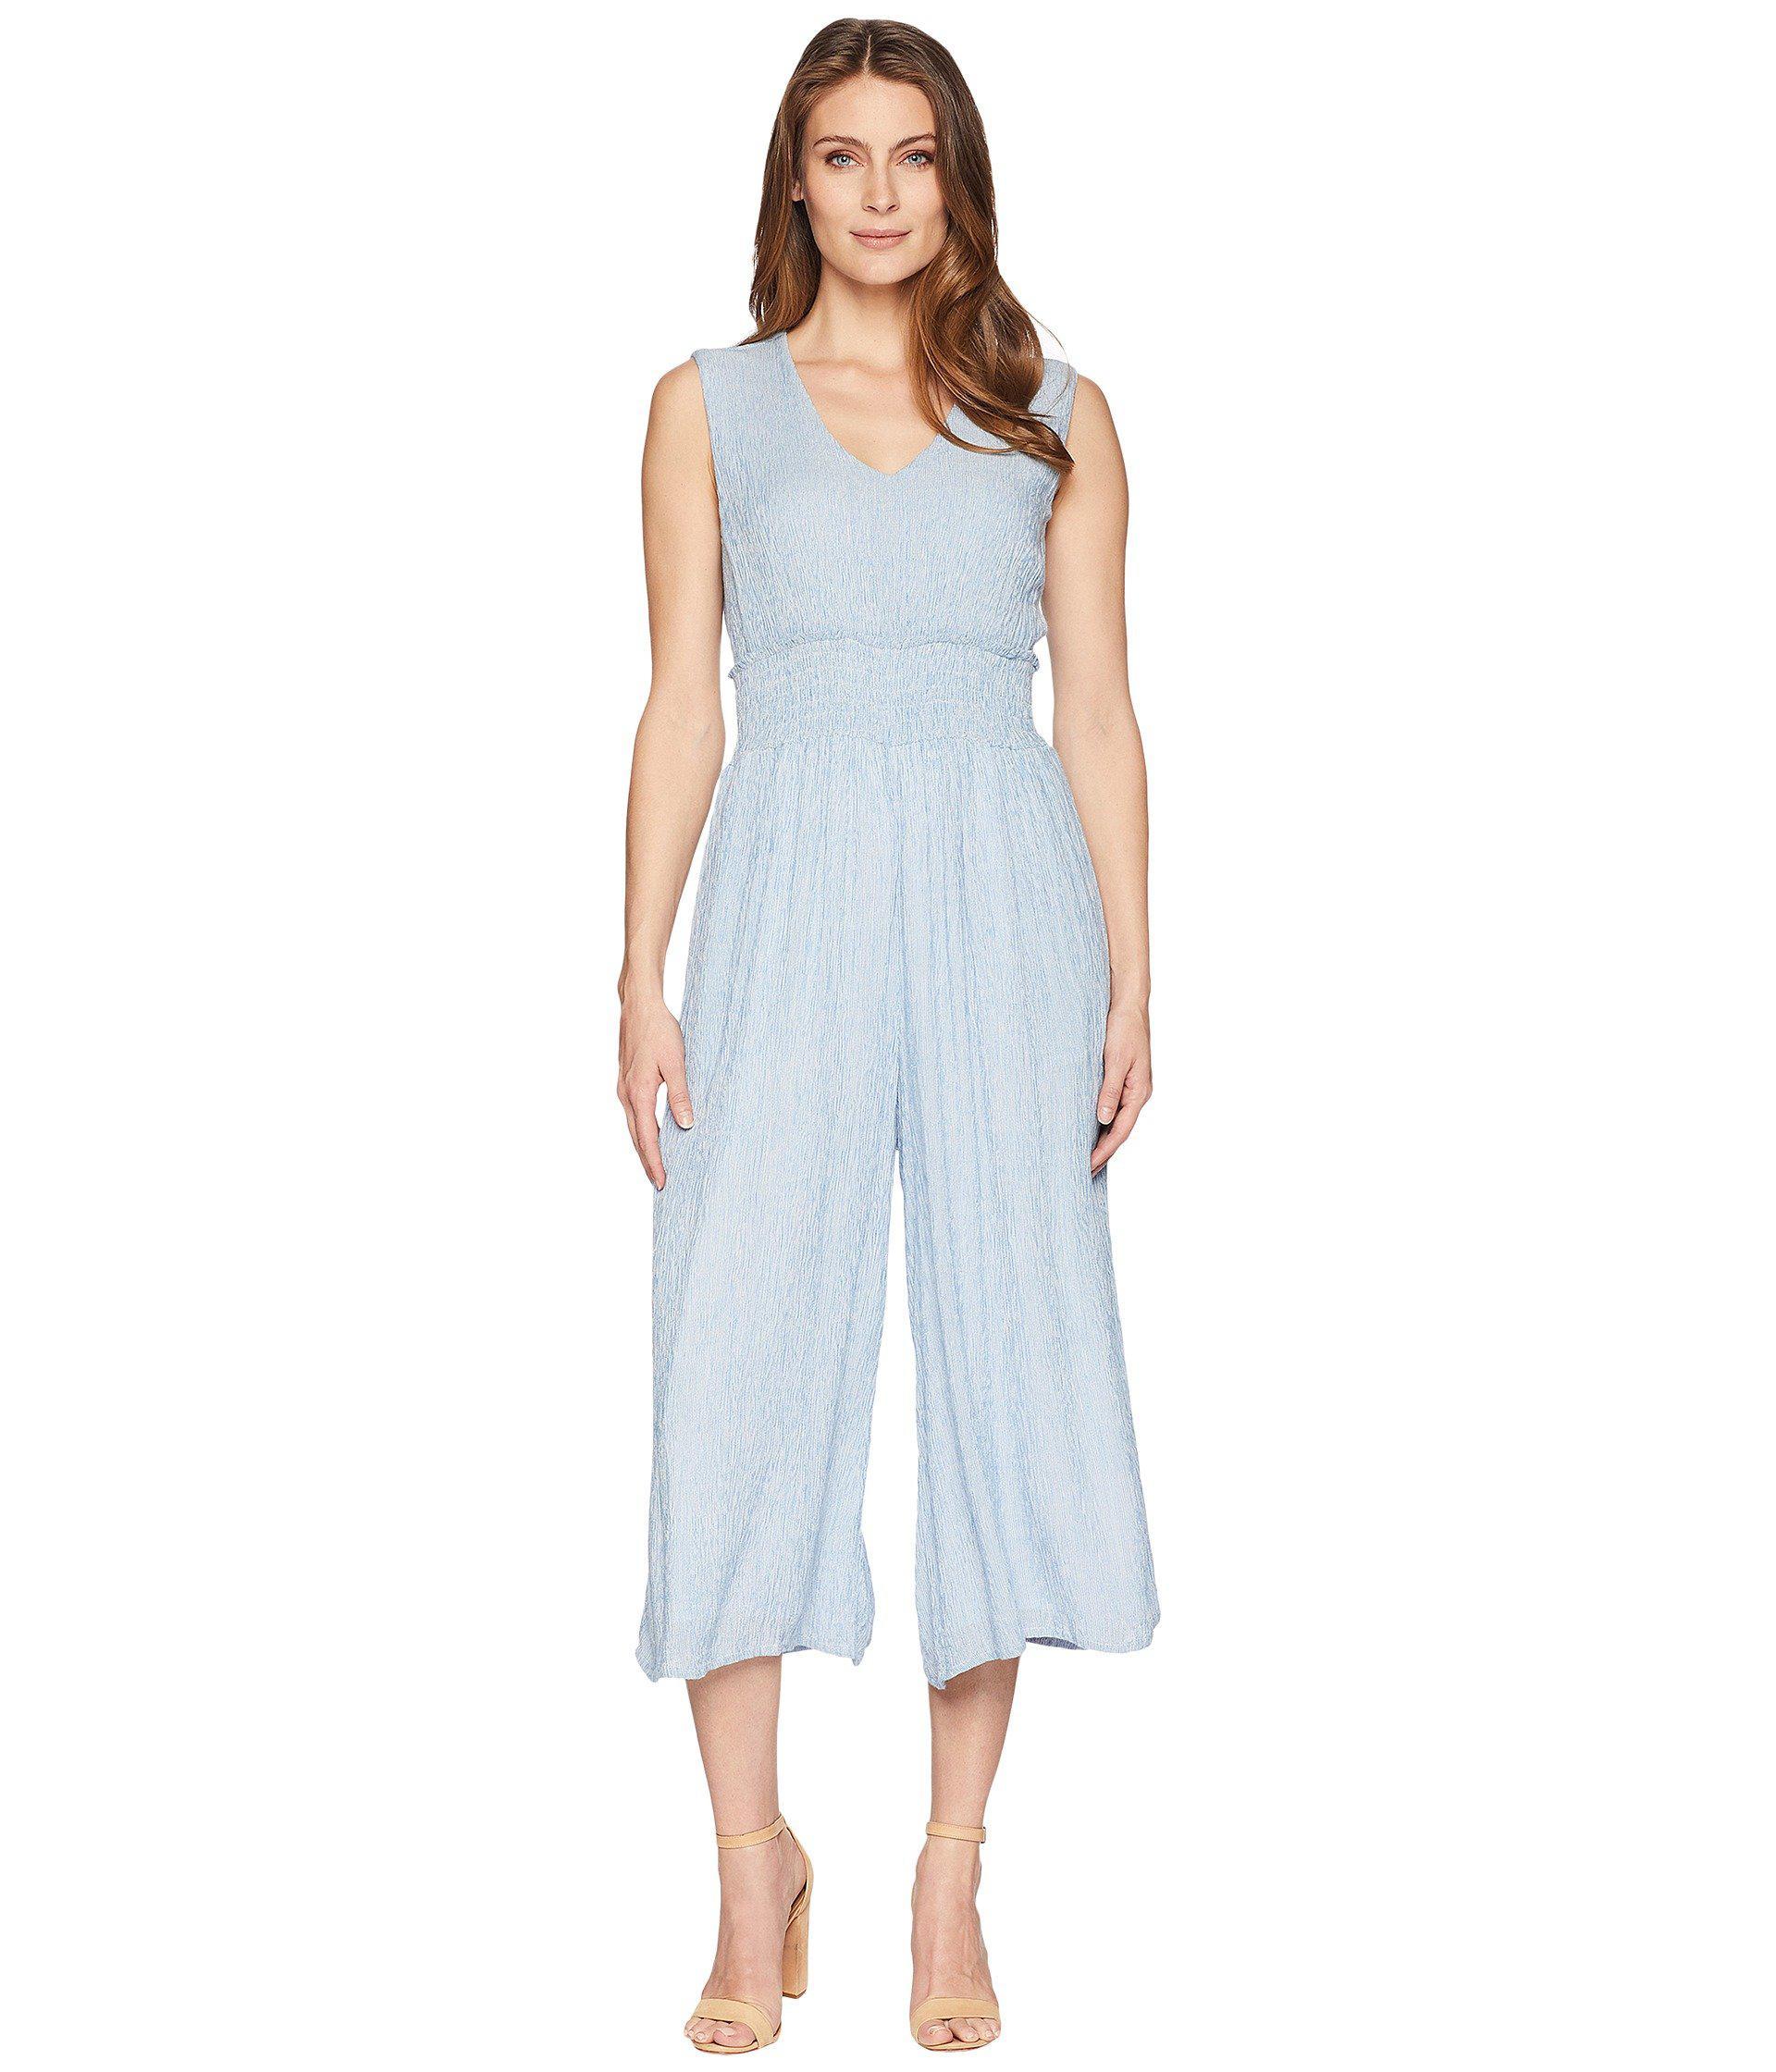 0b3b6ab32fa Lyst - Catherine Malandrino Braden Jumpsuit (blue white Stripe ...